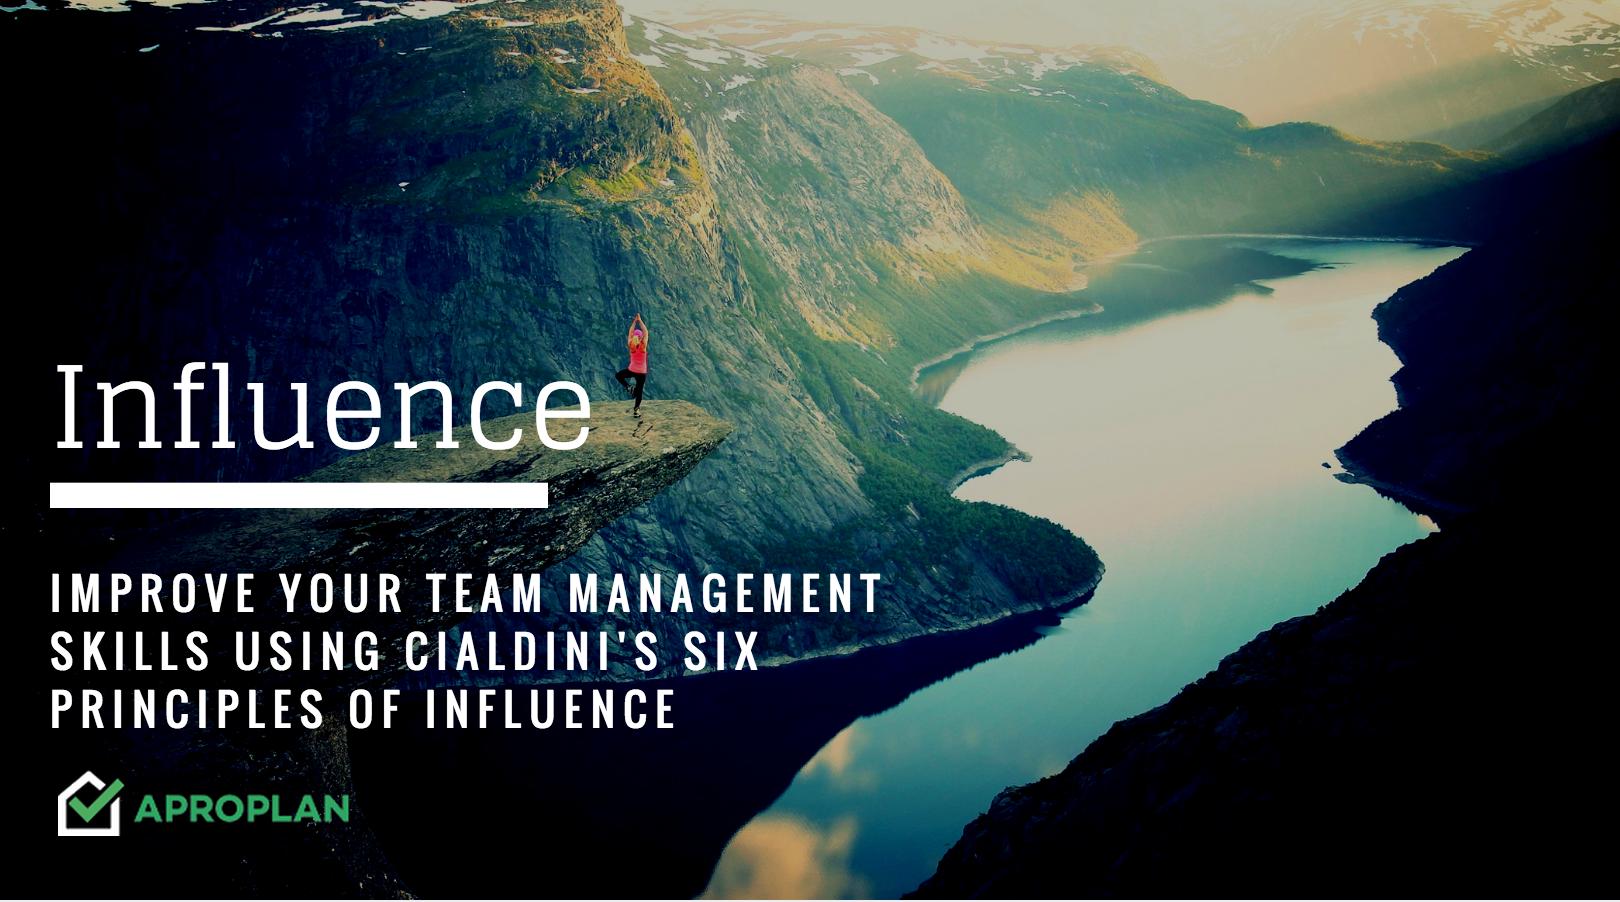 Improve Your Team Management Skills